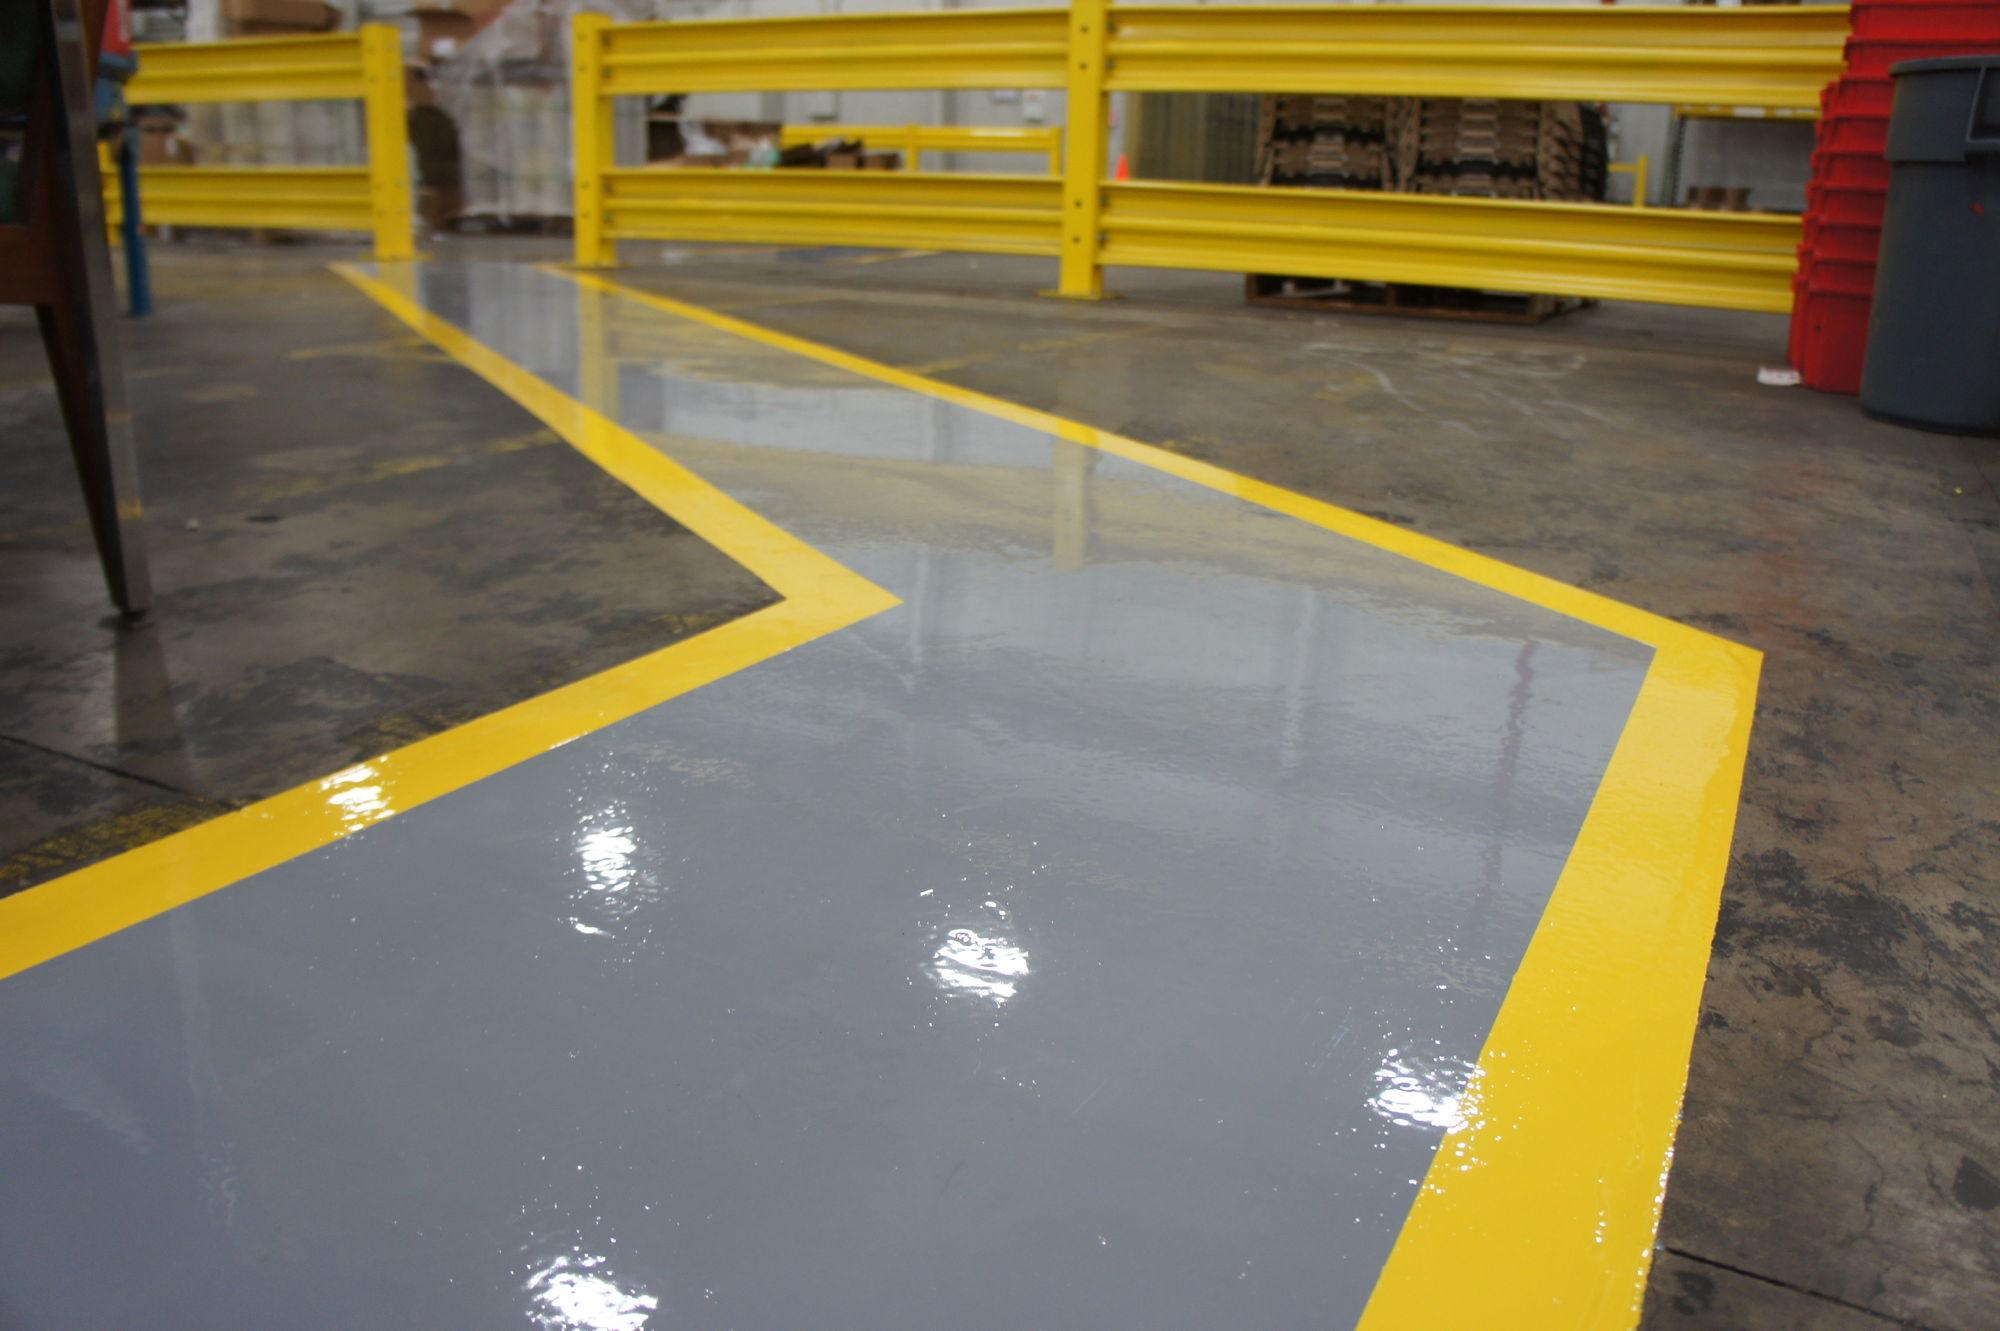 Loading Dock Floor Plan Warehouse Organization And Traffic Management Tips Blog